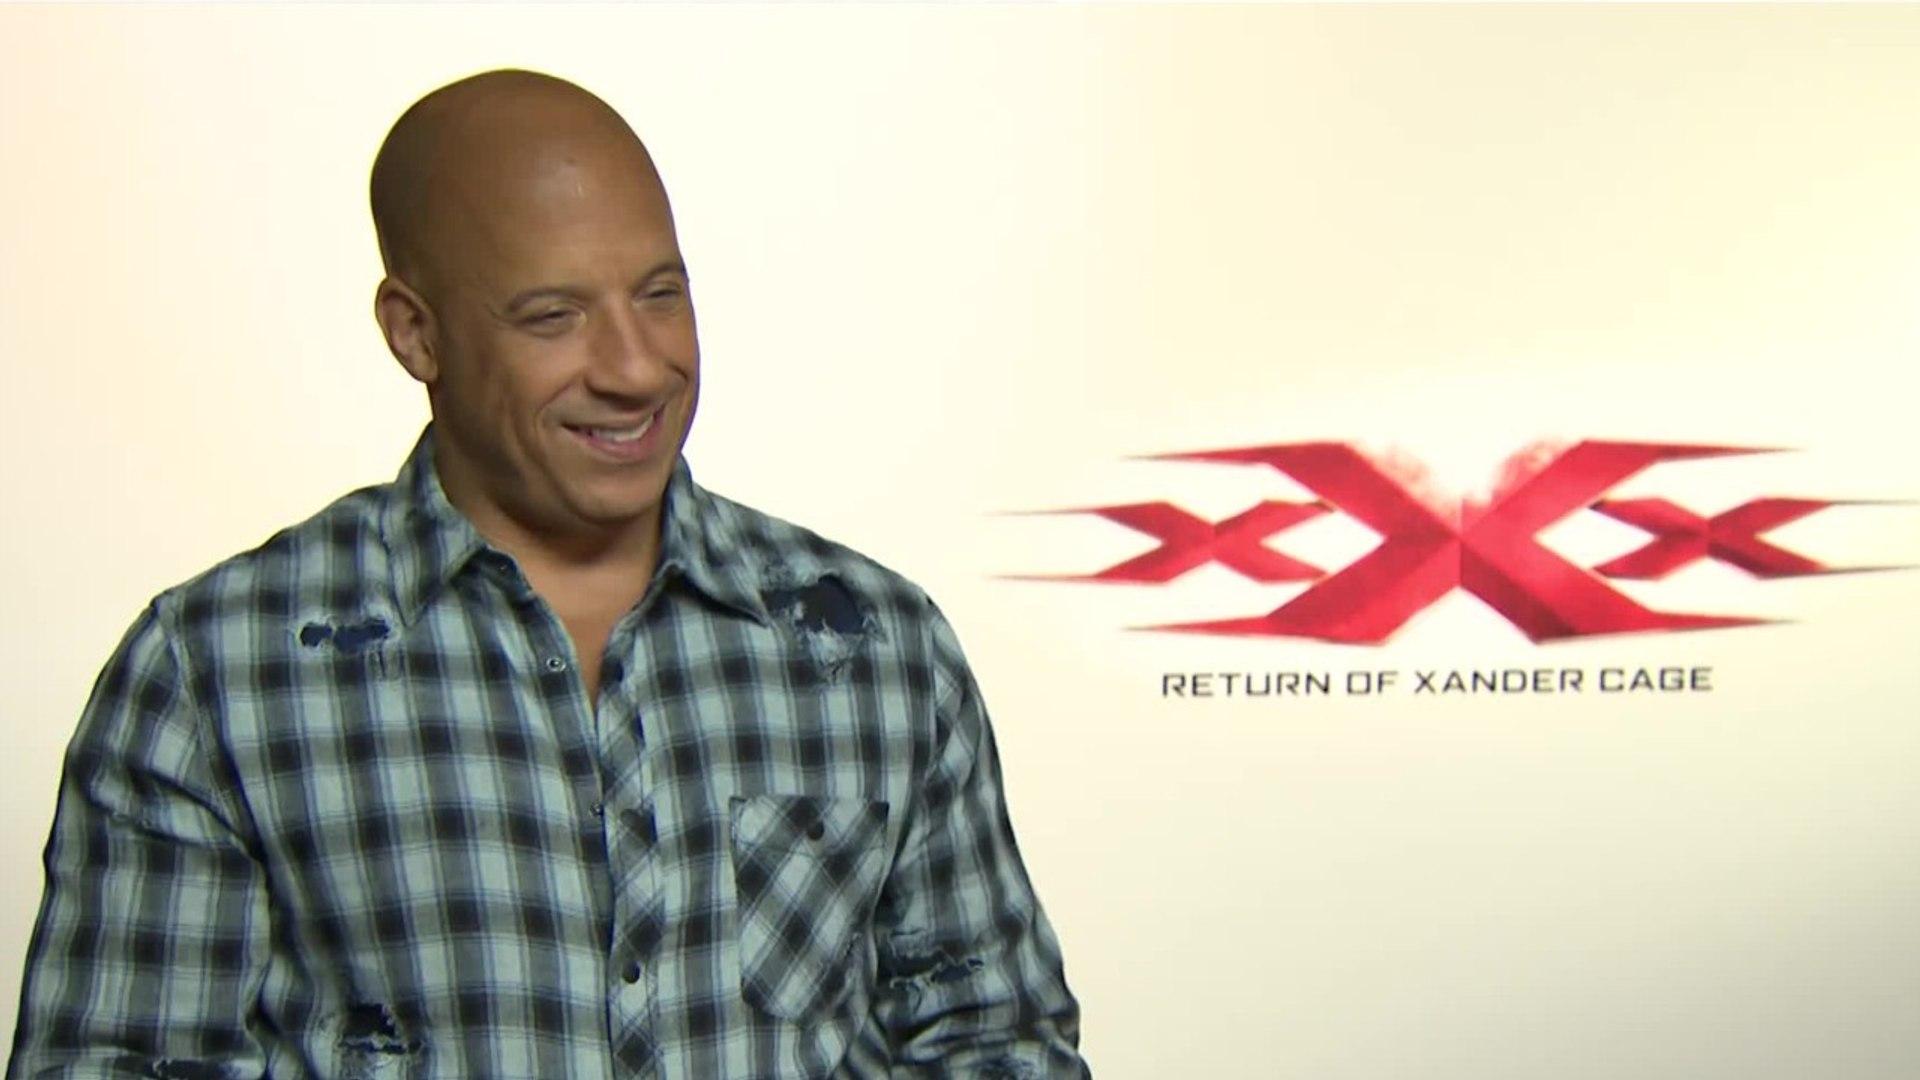 Vin Diesel's 'Bloodshot' Synopsis Revealed